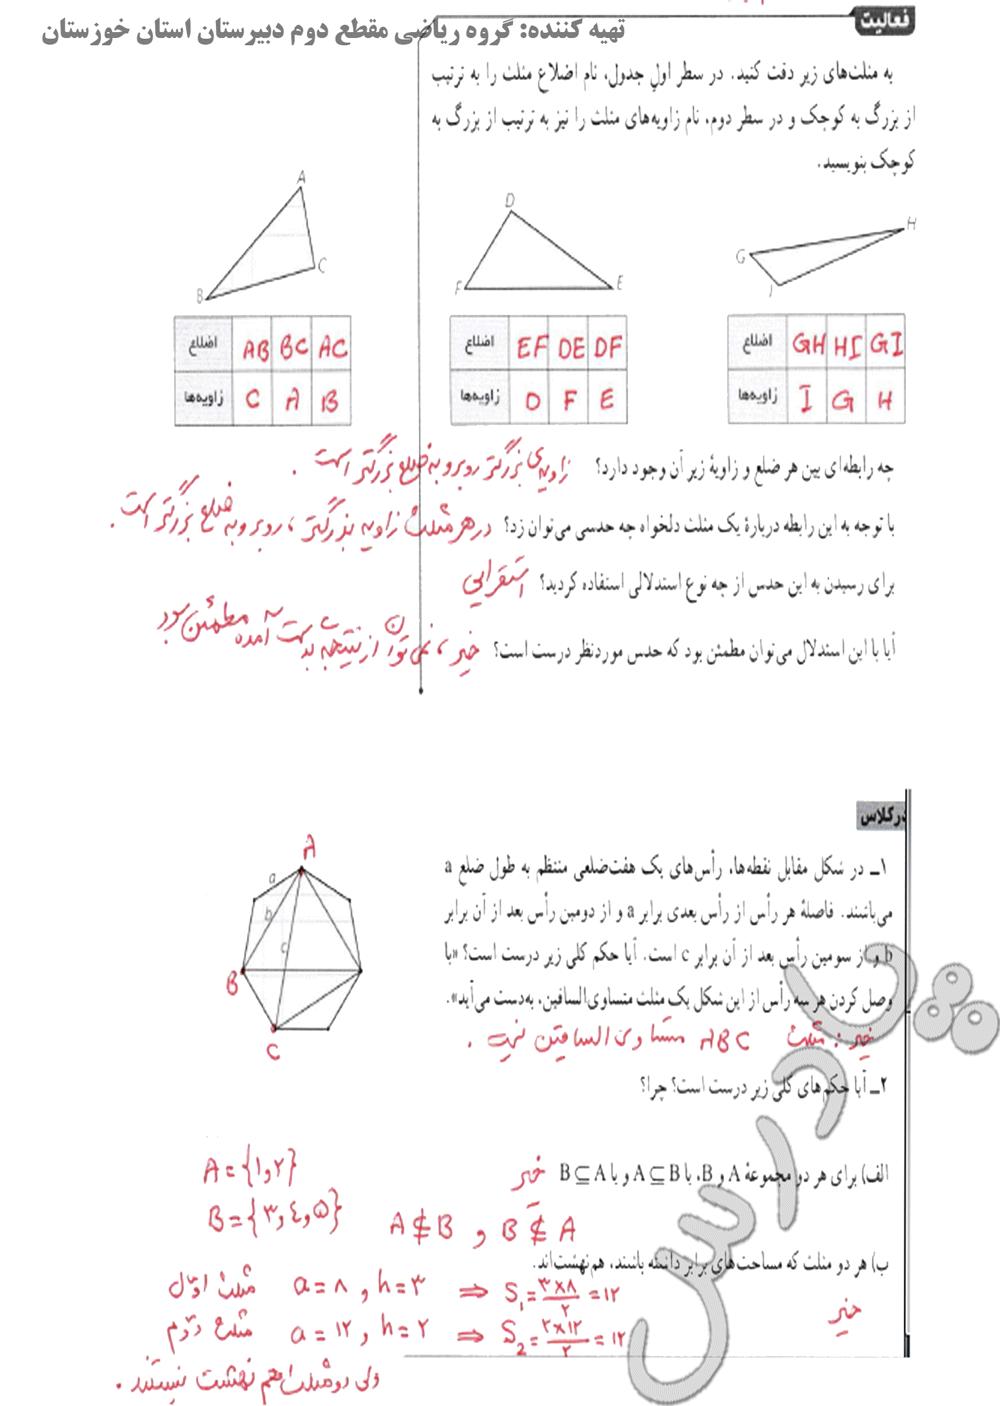 حل فعالیت ص 21 و فعالیت ص 27 فصل اول هندسه دهم